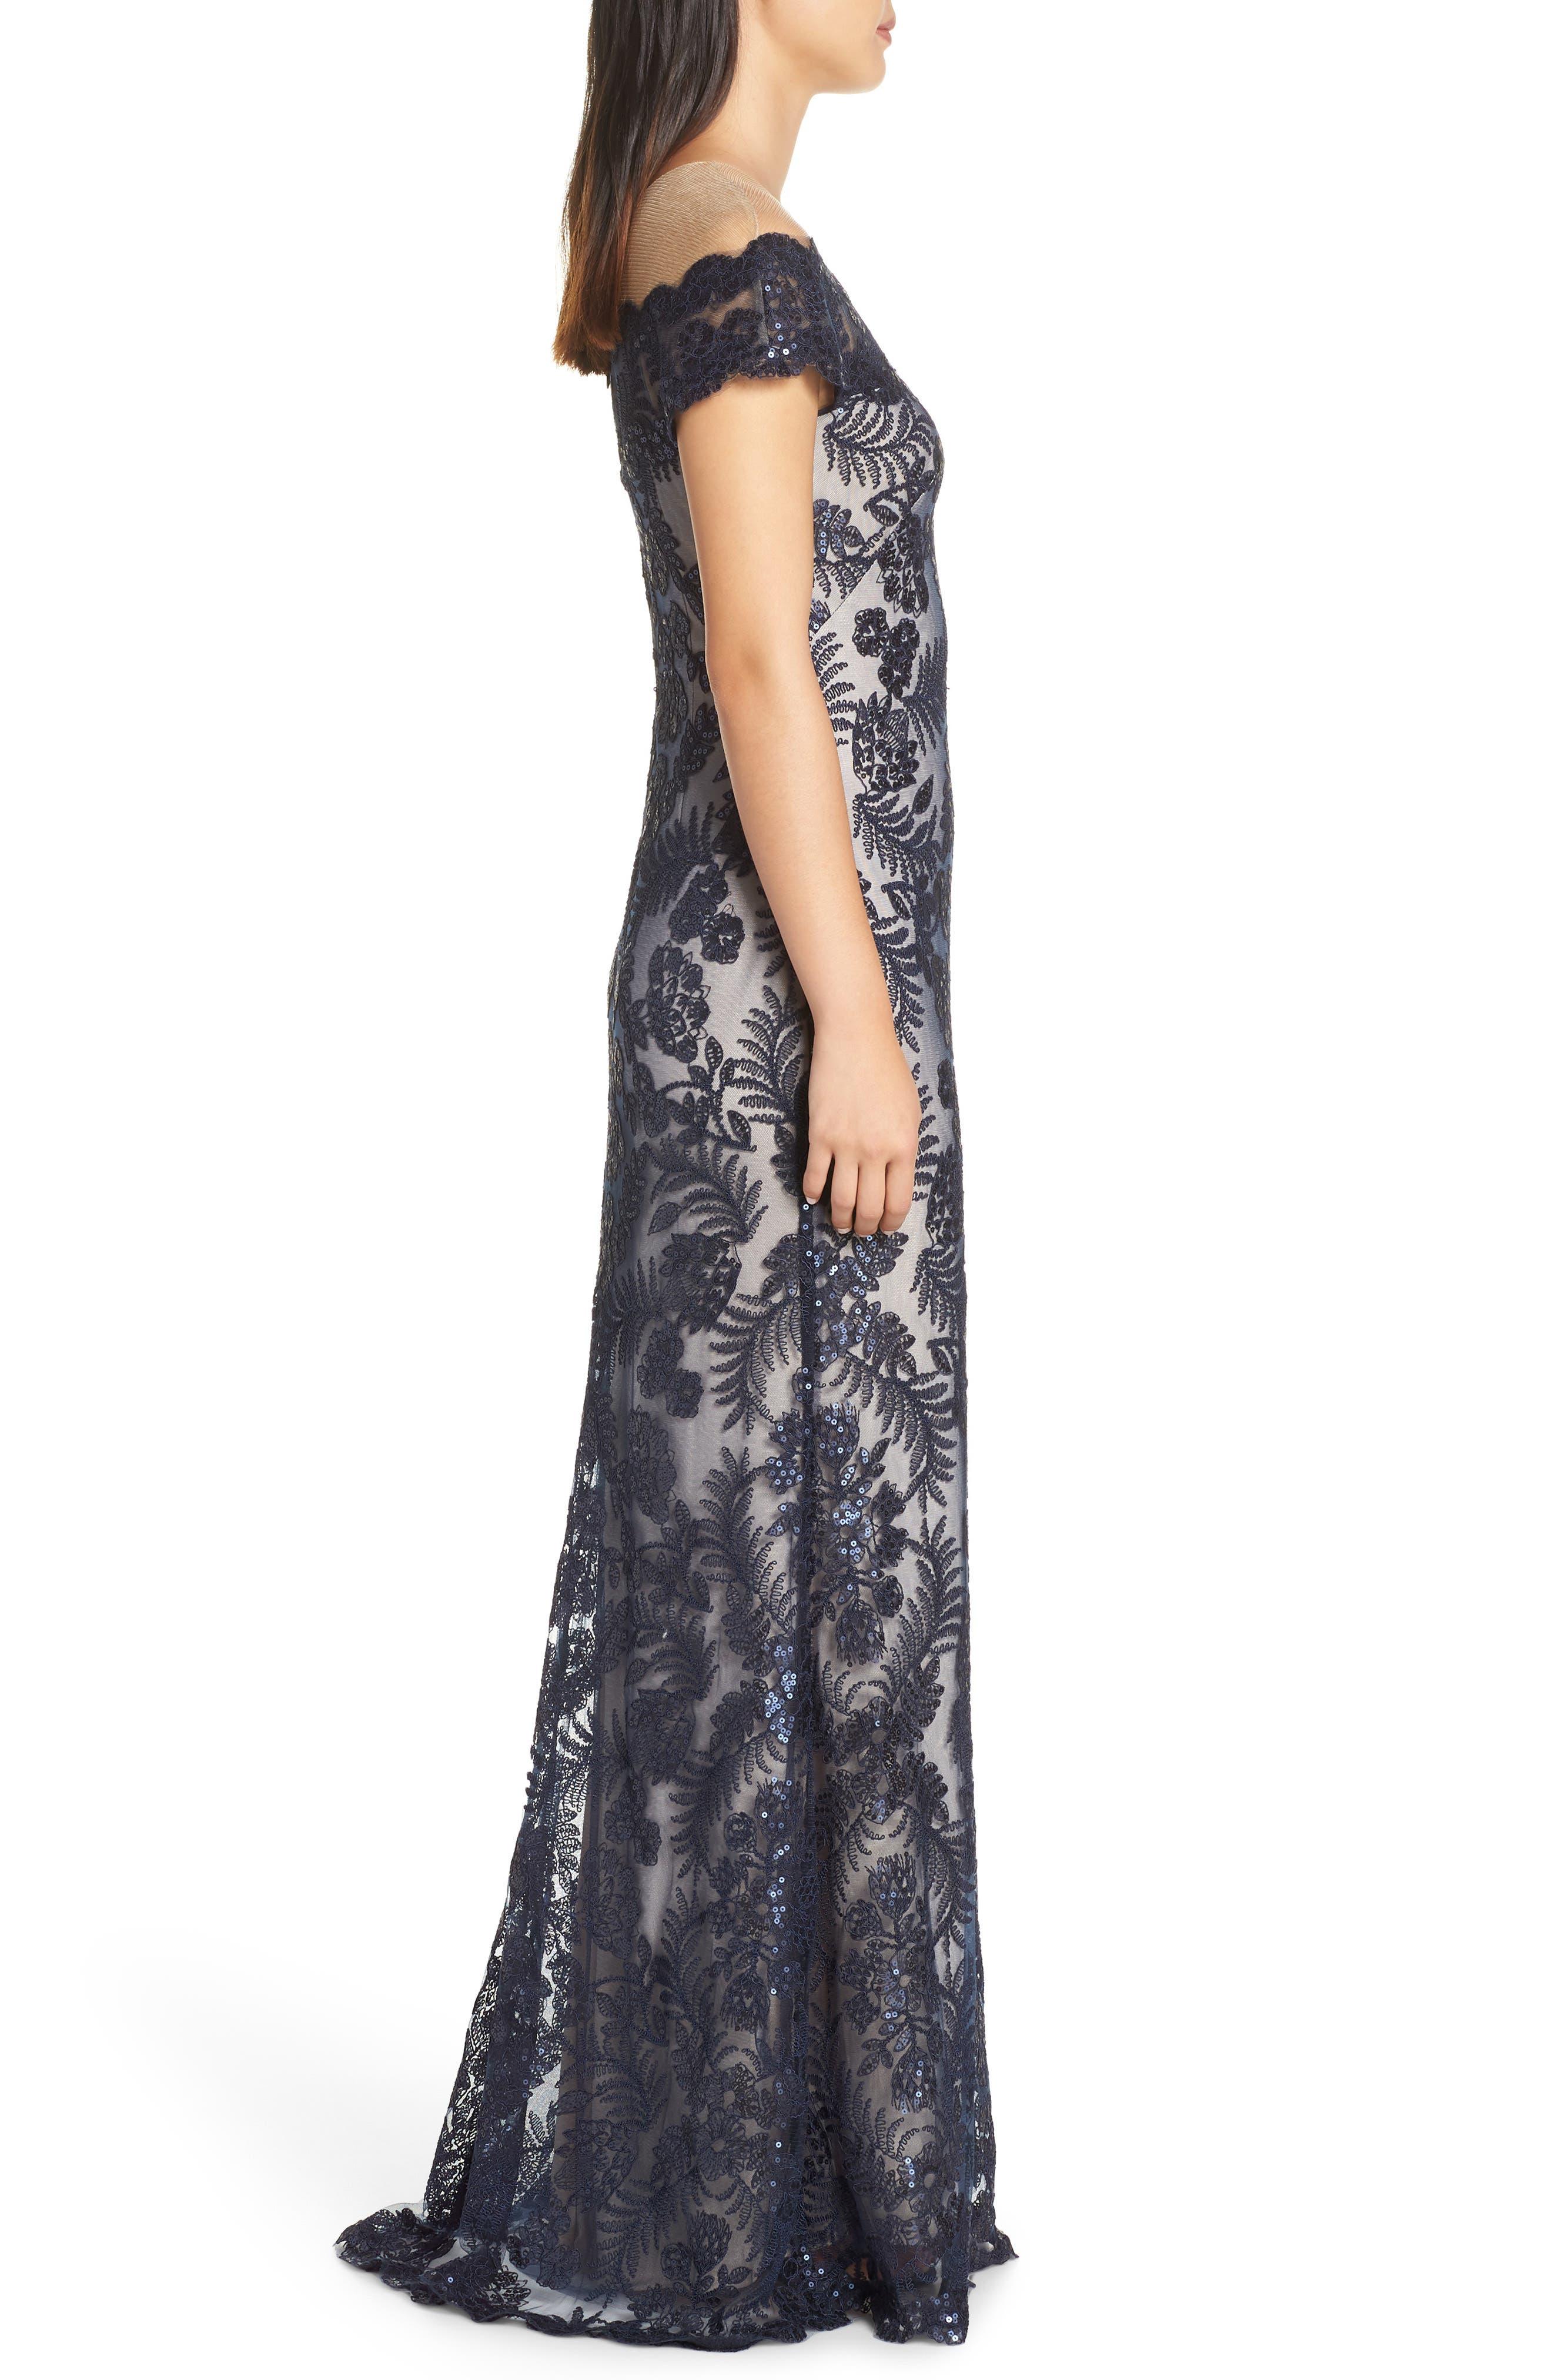 TADASHI SHOJI, Illusion Neck Sequin Lace Gown, Alternate thumbnail 5, color, 410